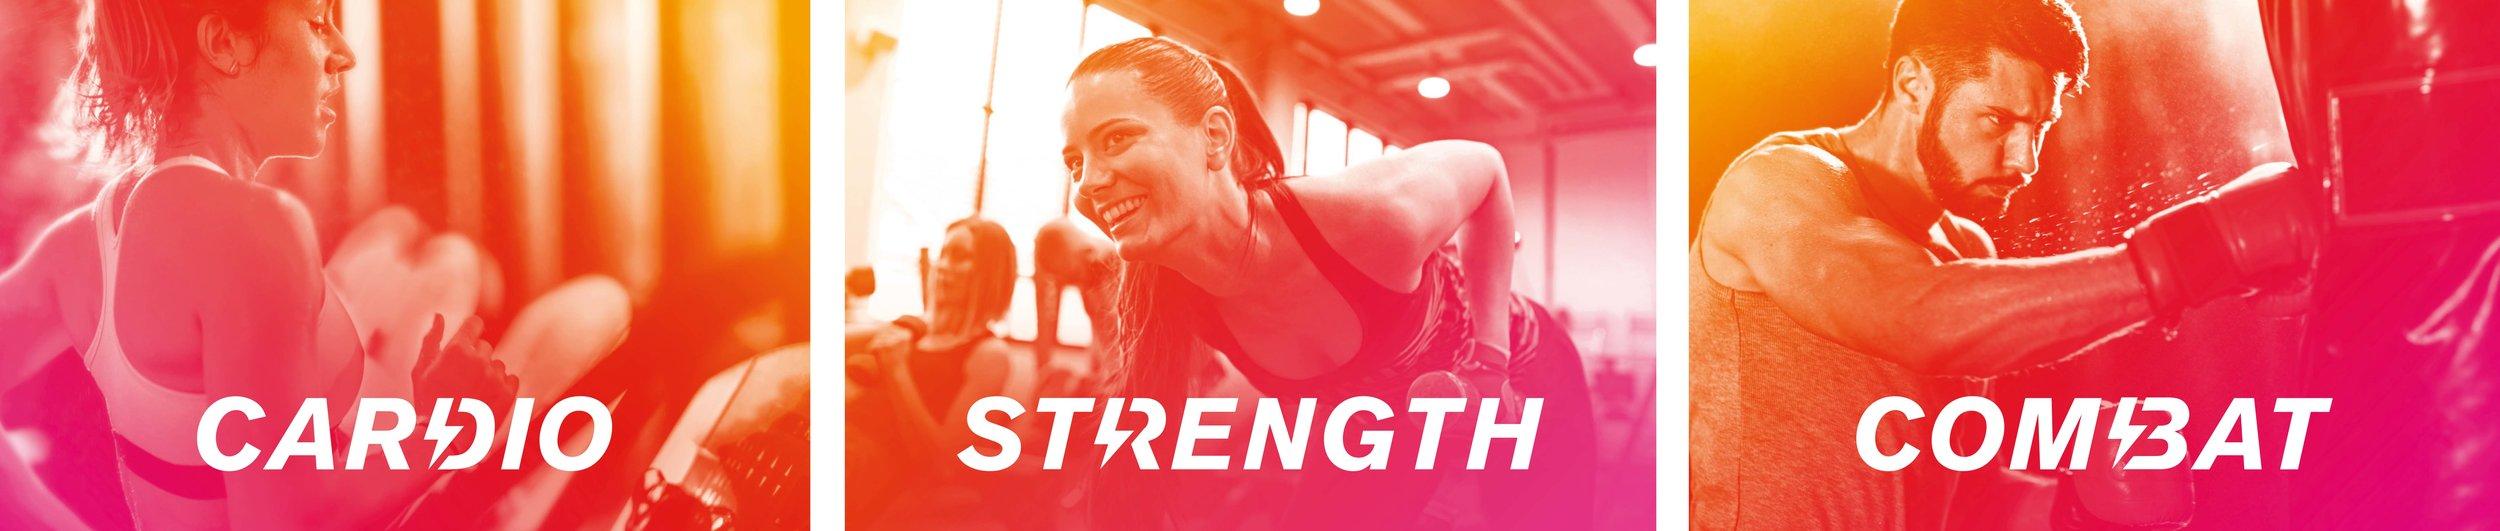 Cardio, strength, combat.jpg